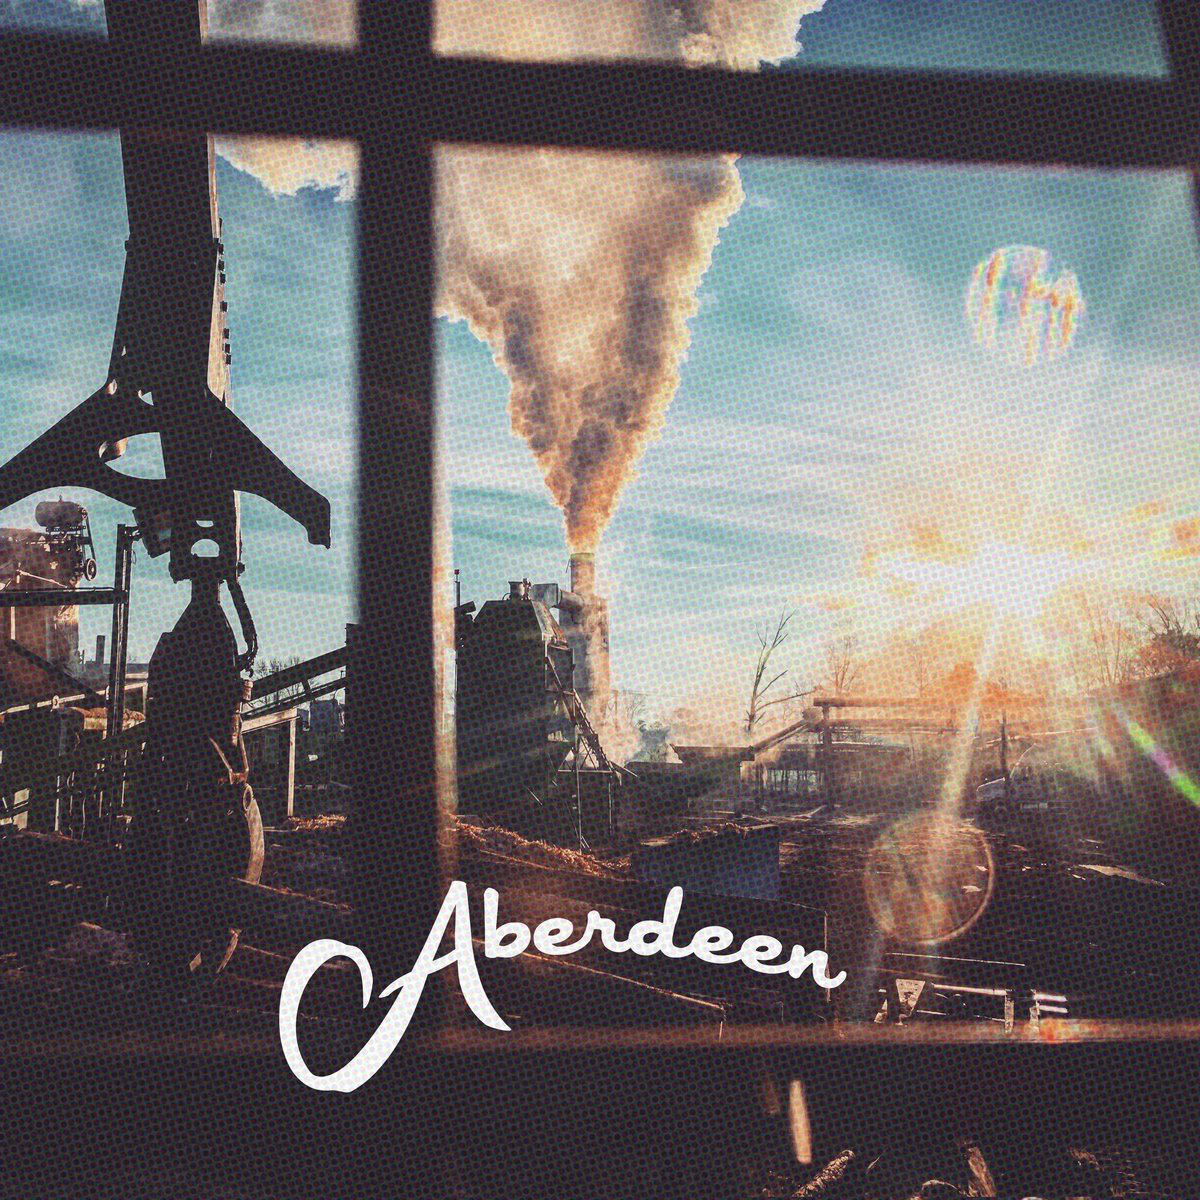 Lost Lander - Aberdeen   Mixed by John Morgan Askew